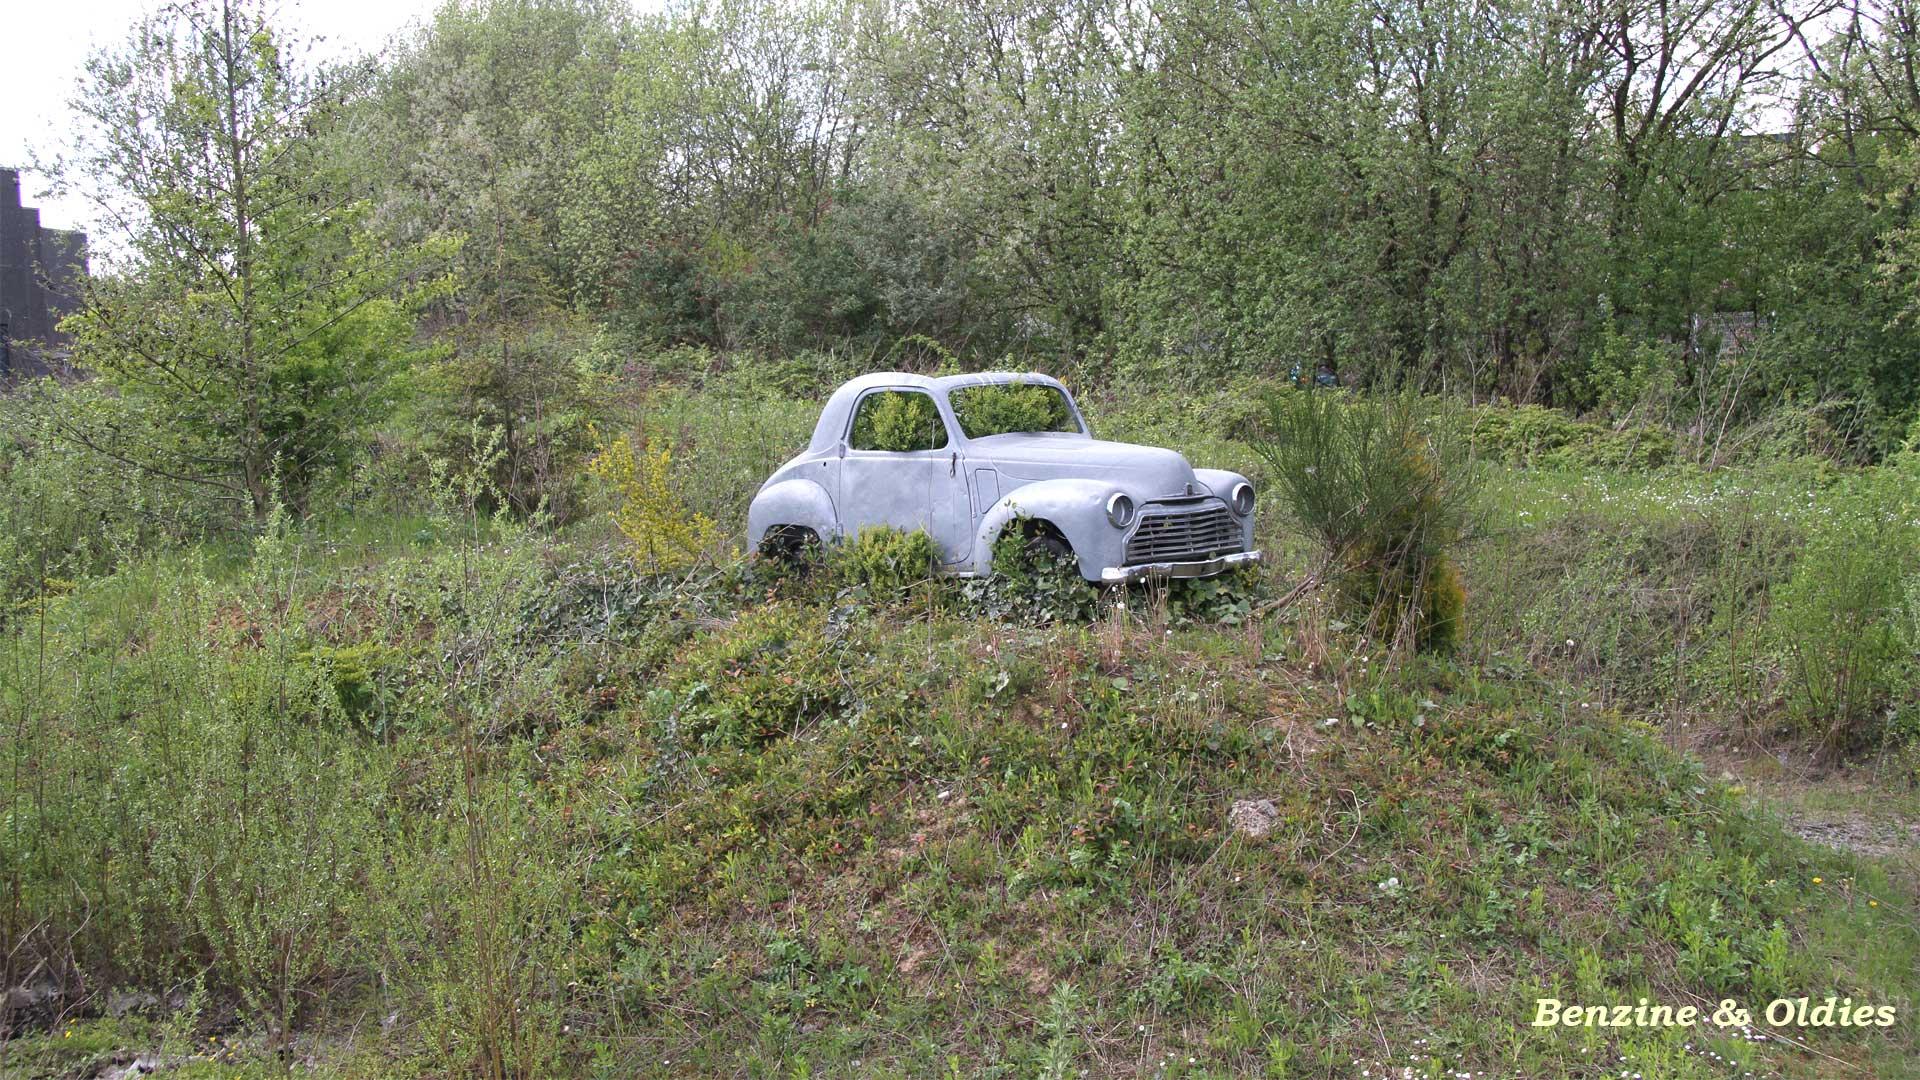 une Simca 6 carrosserie aluminium oubliée dans la nature - Simca6 535151simca6street04w19201080